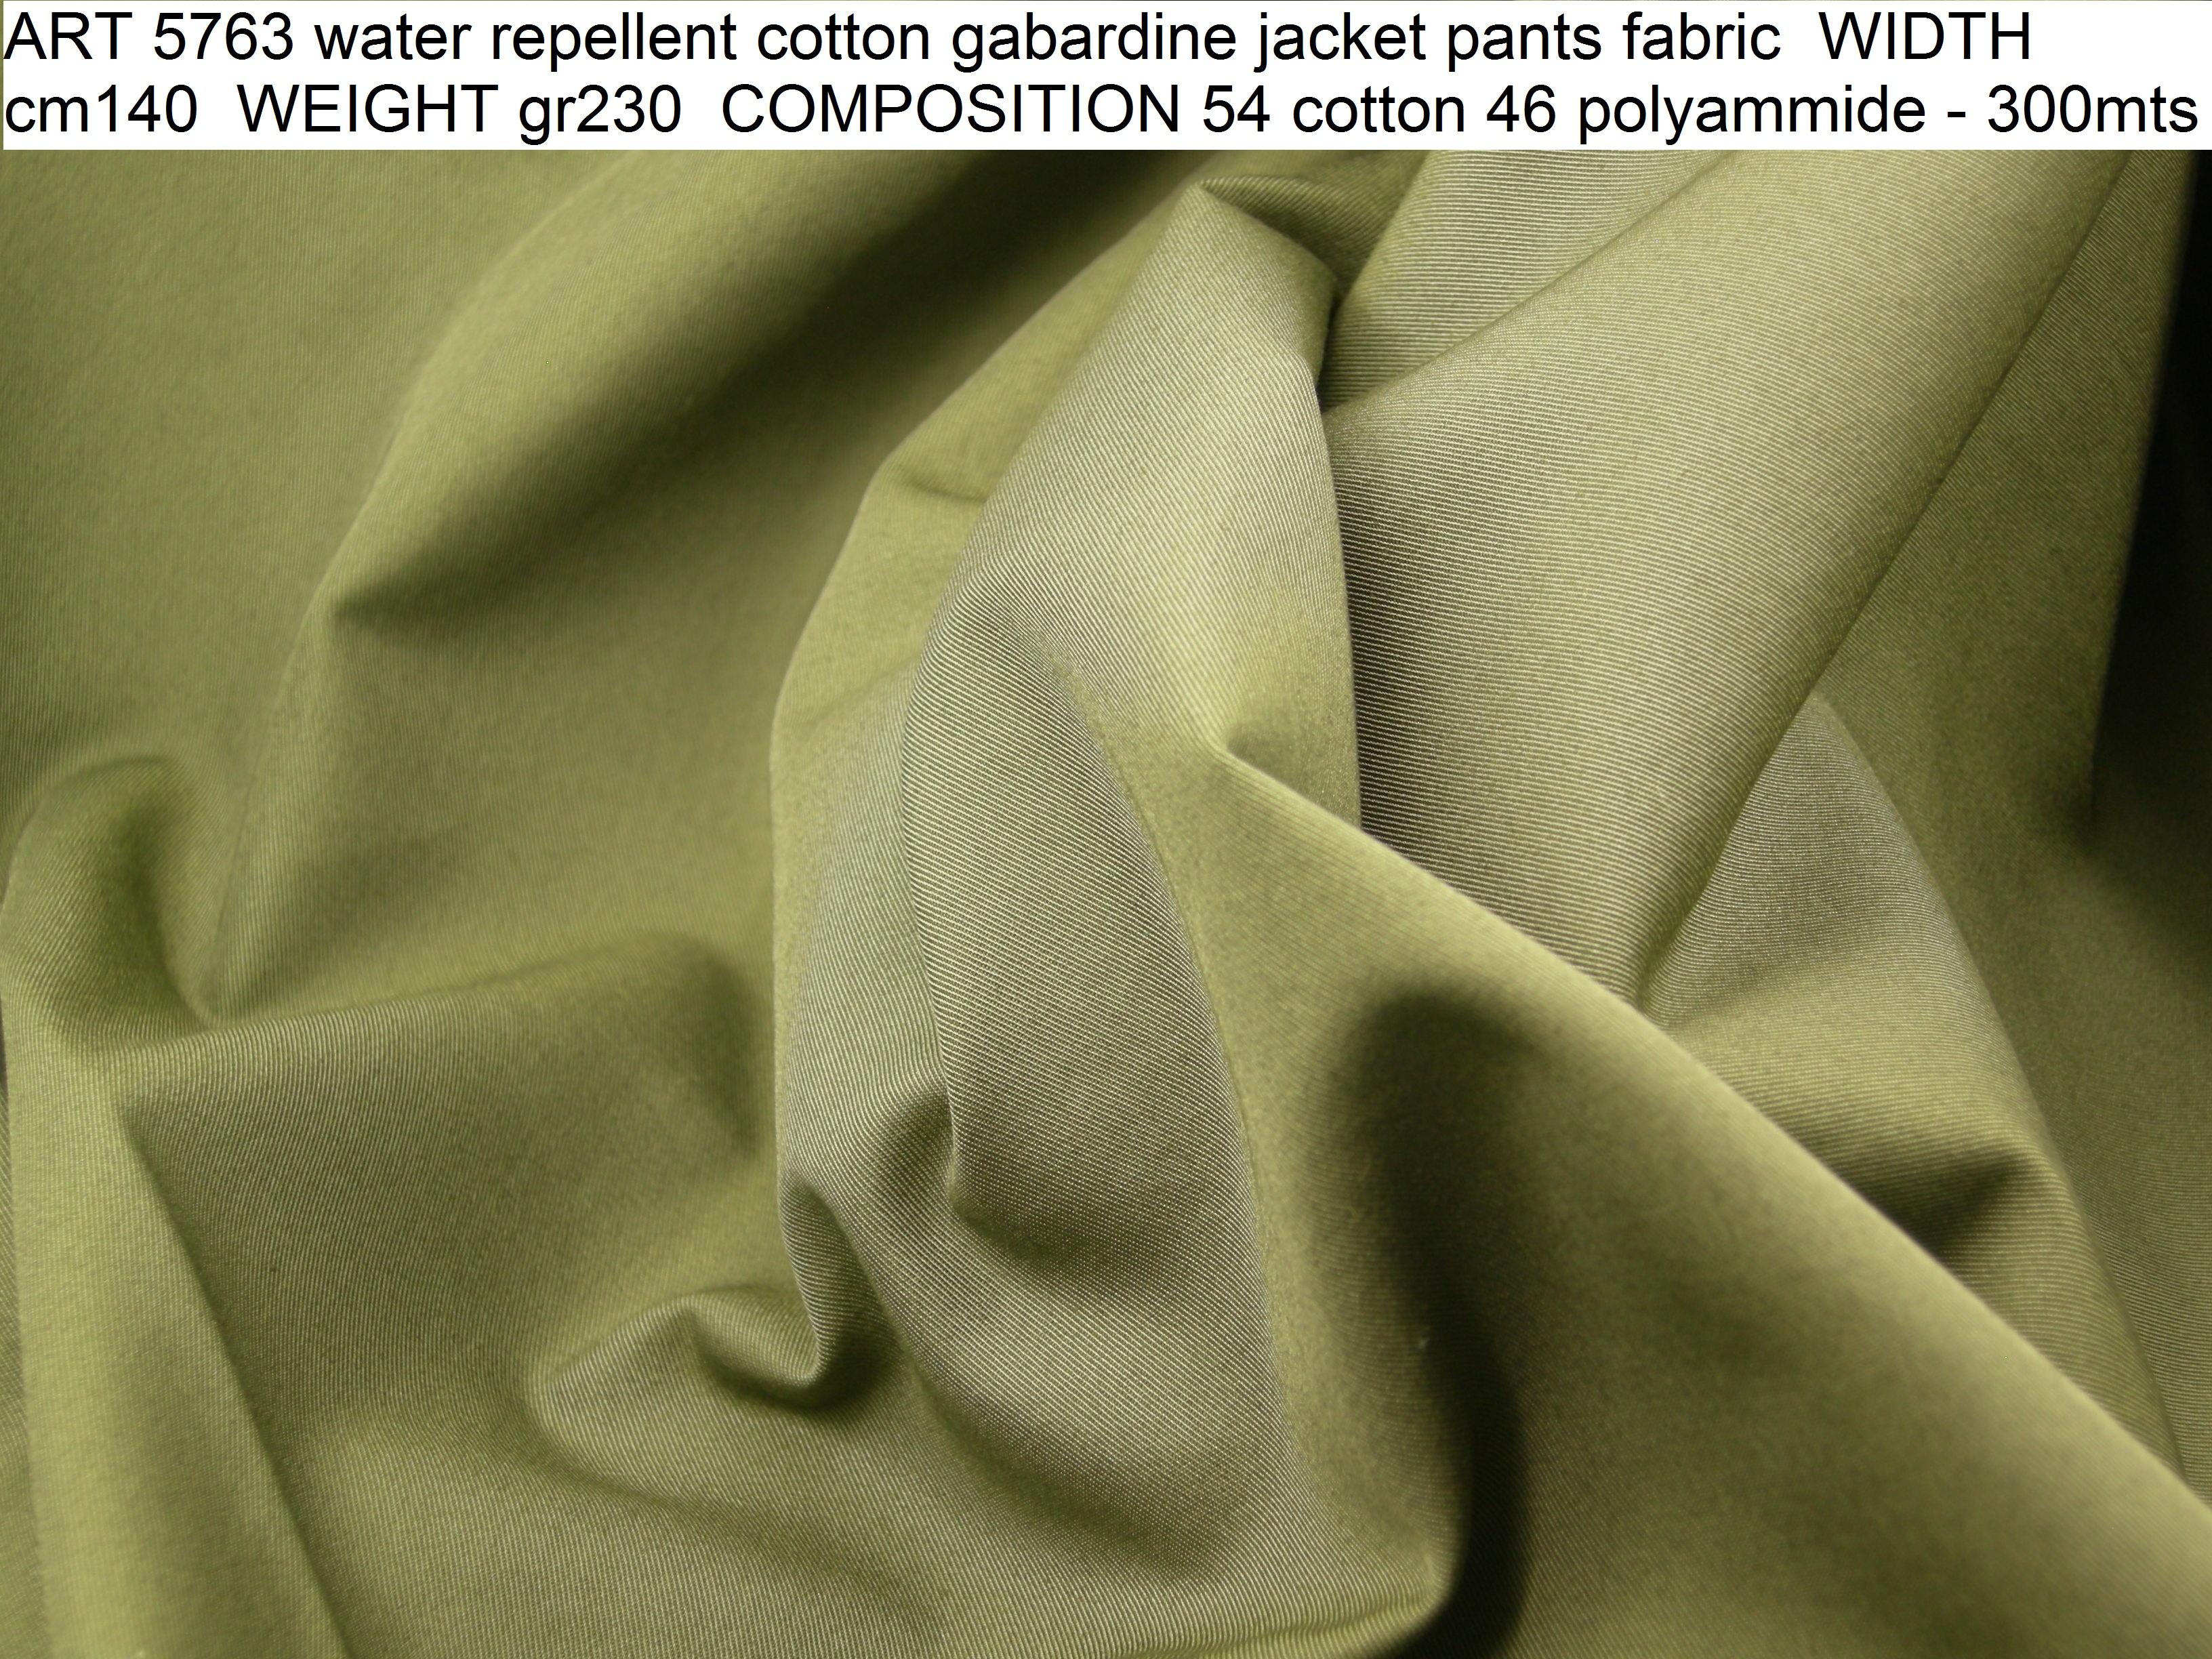 ART 5763 water repellent cotton gabardine jacket pants fabric WIDTH cm140 WEIGHT gr230 COMPOSITION 54 cotton 46 polyammide - 300mts